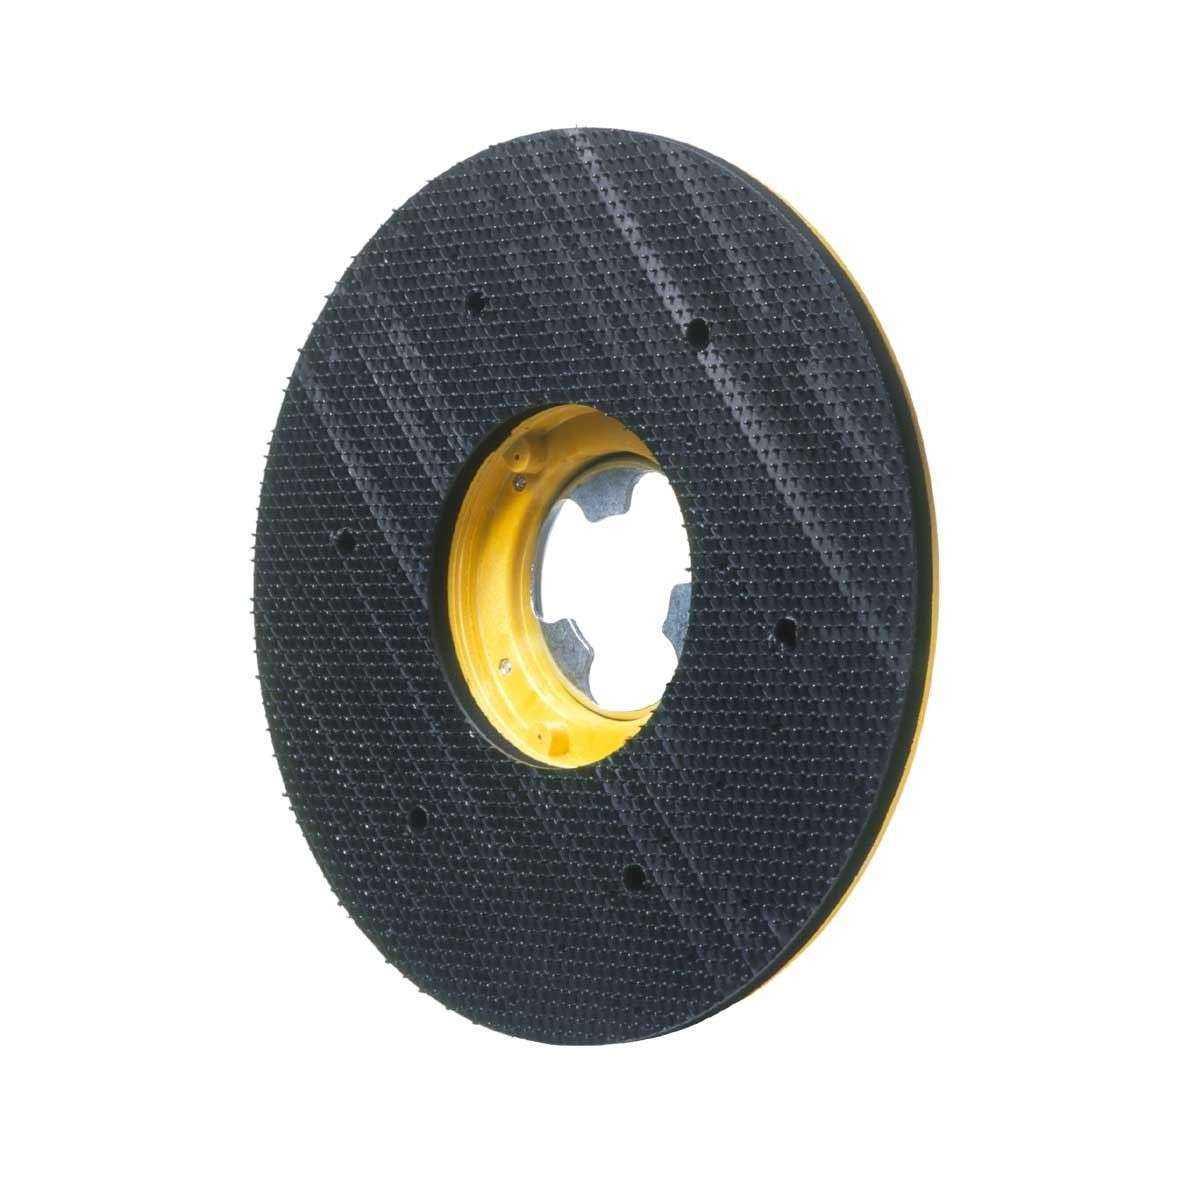 plateau porte disque diam 430mm pour monobrosse basse vitesse. Black Bedroom Furniture Sets. Home Design Ideas